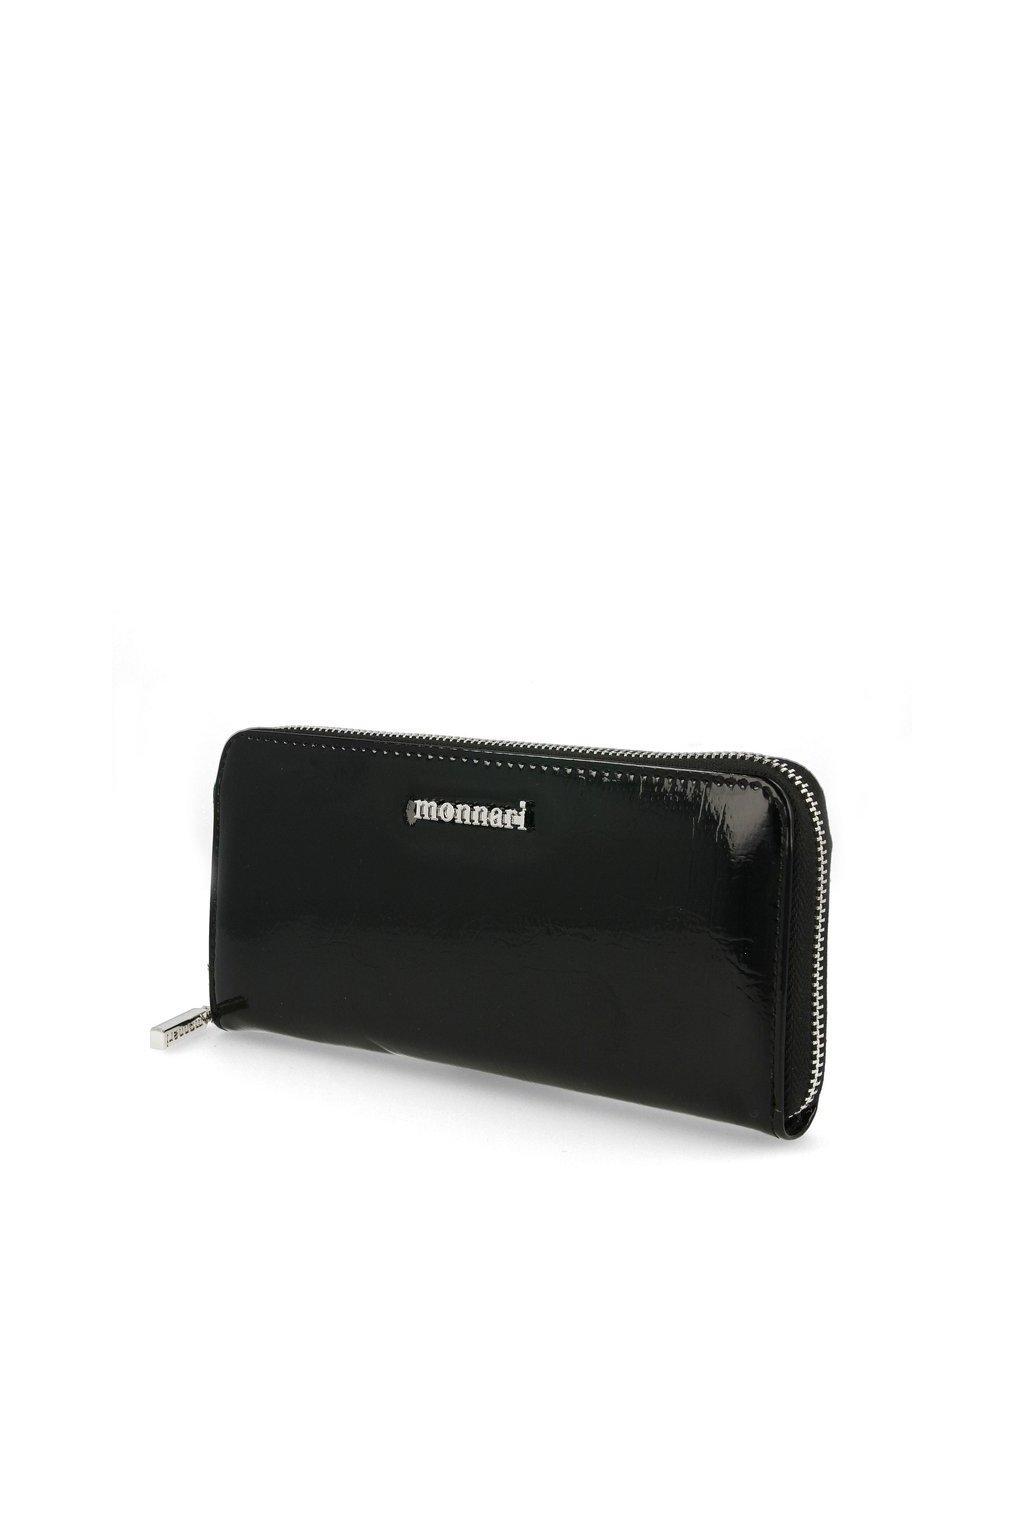 Peňaženka farba čierna kód PUR0100-020